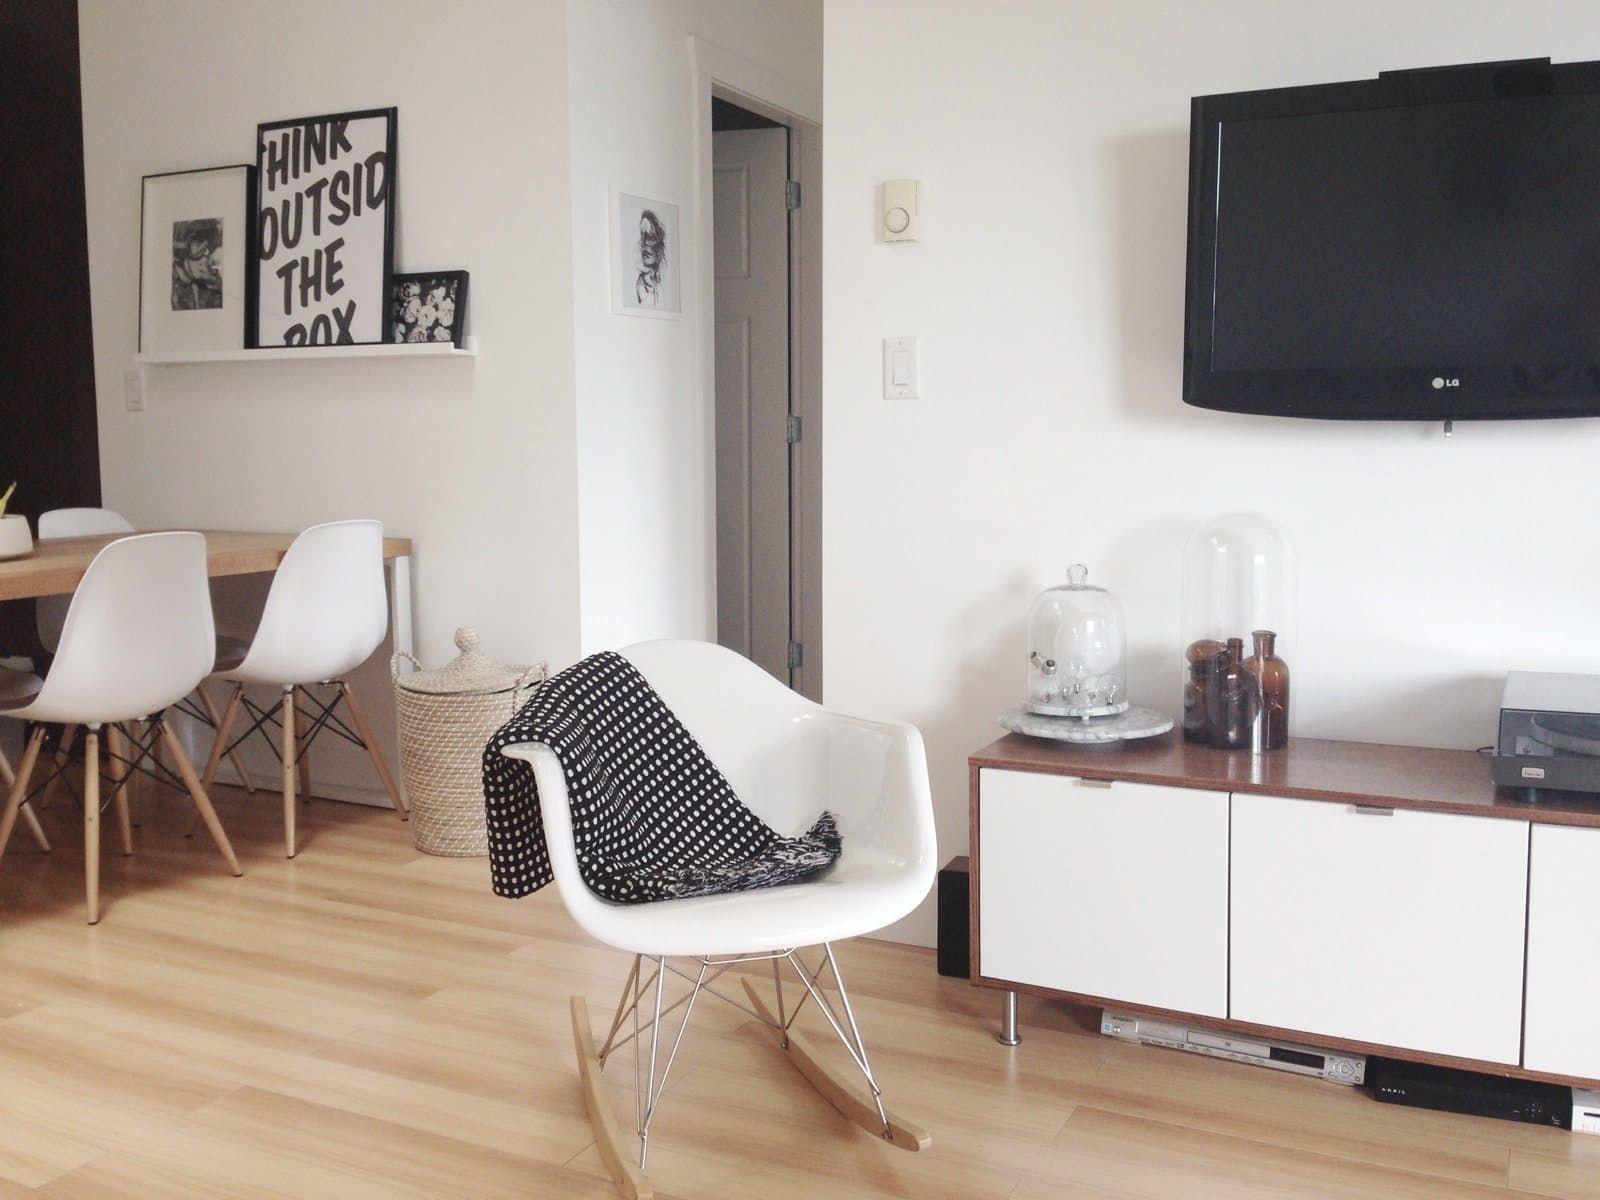 Dani's Lovely Canadian Condo Haus deko, Haus wohnzimmer